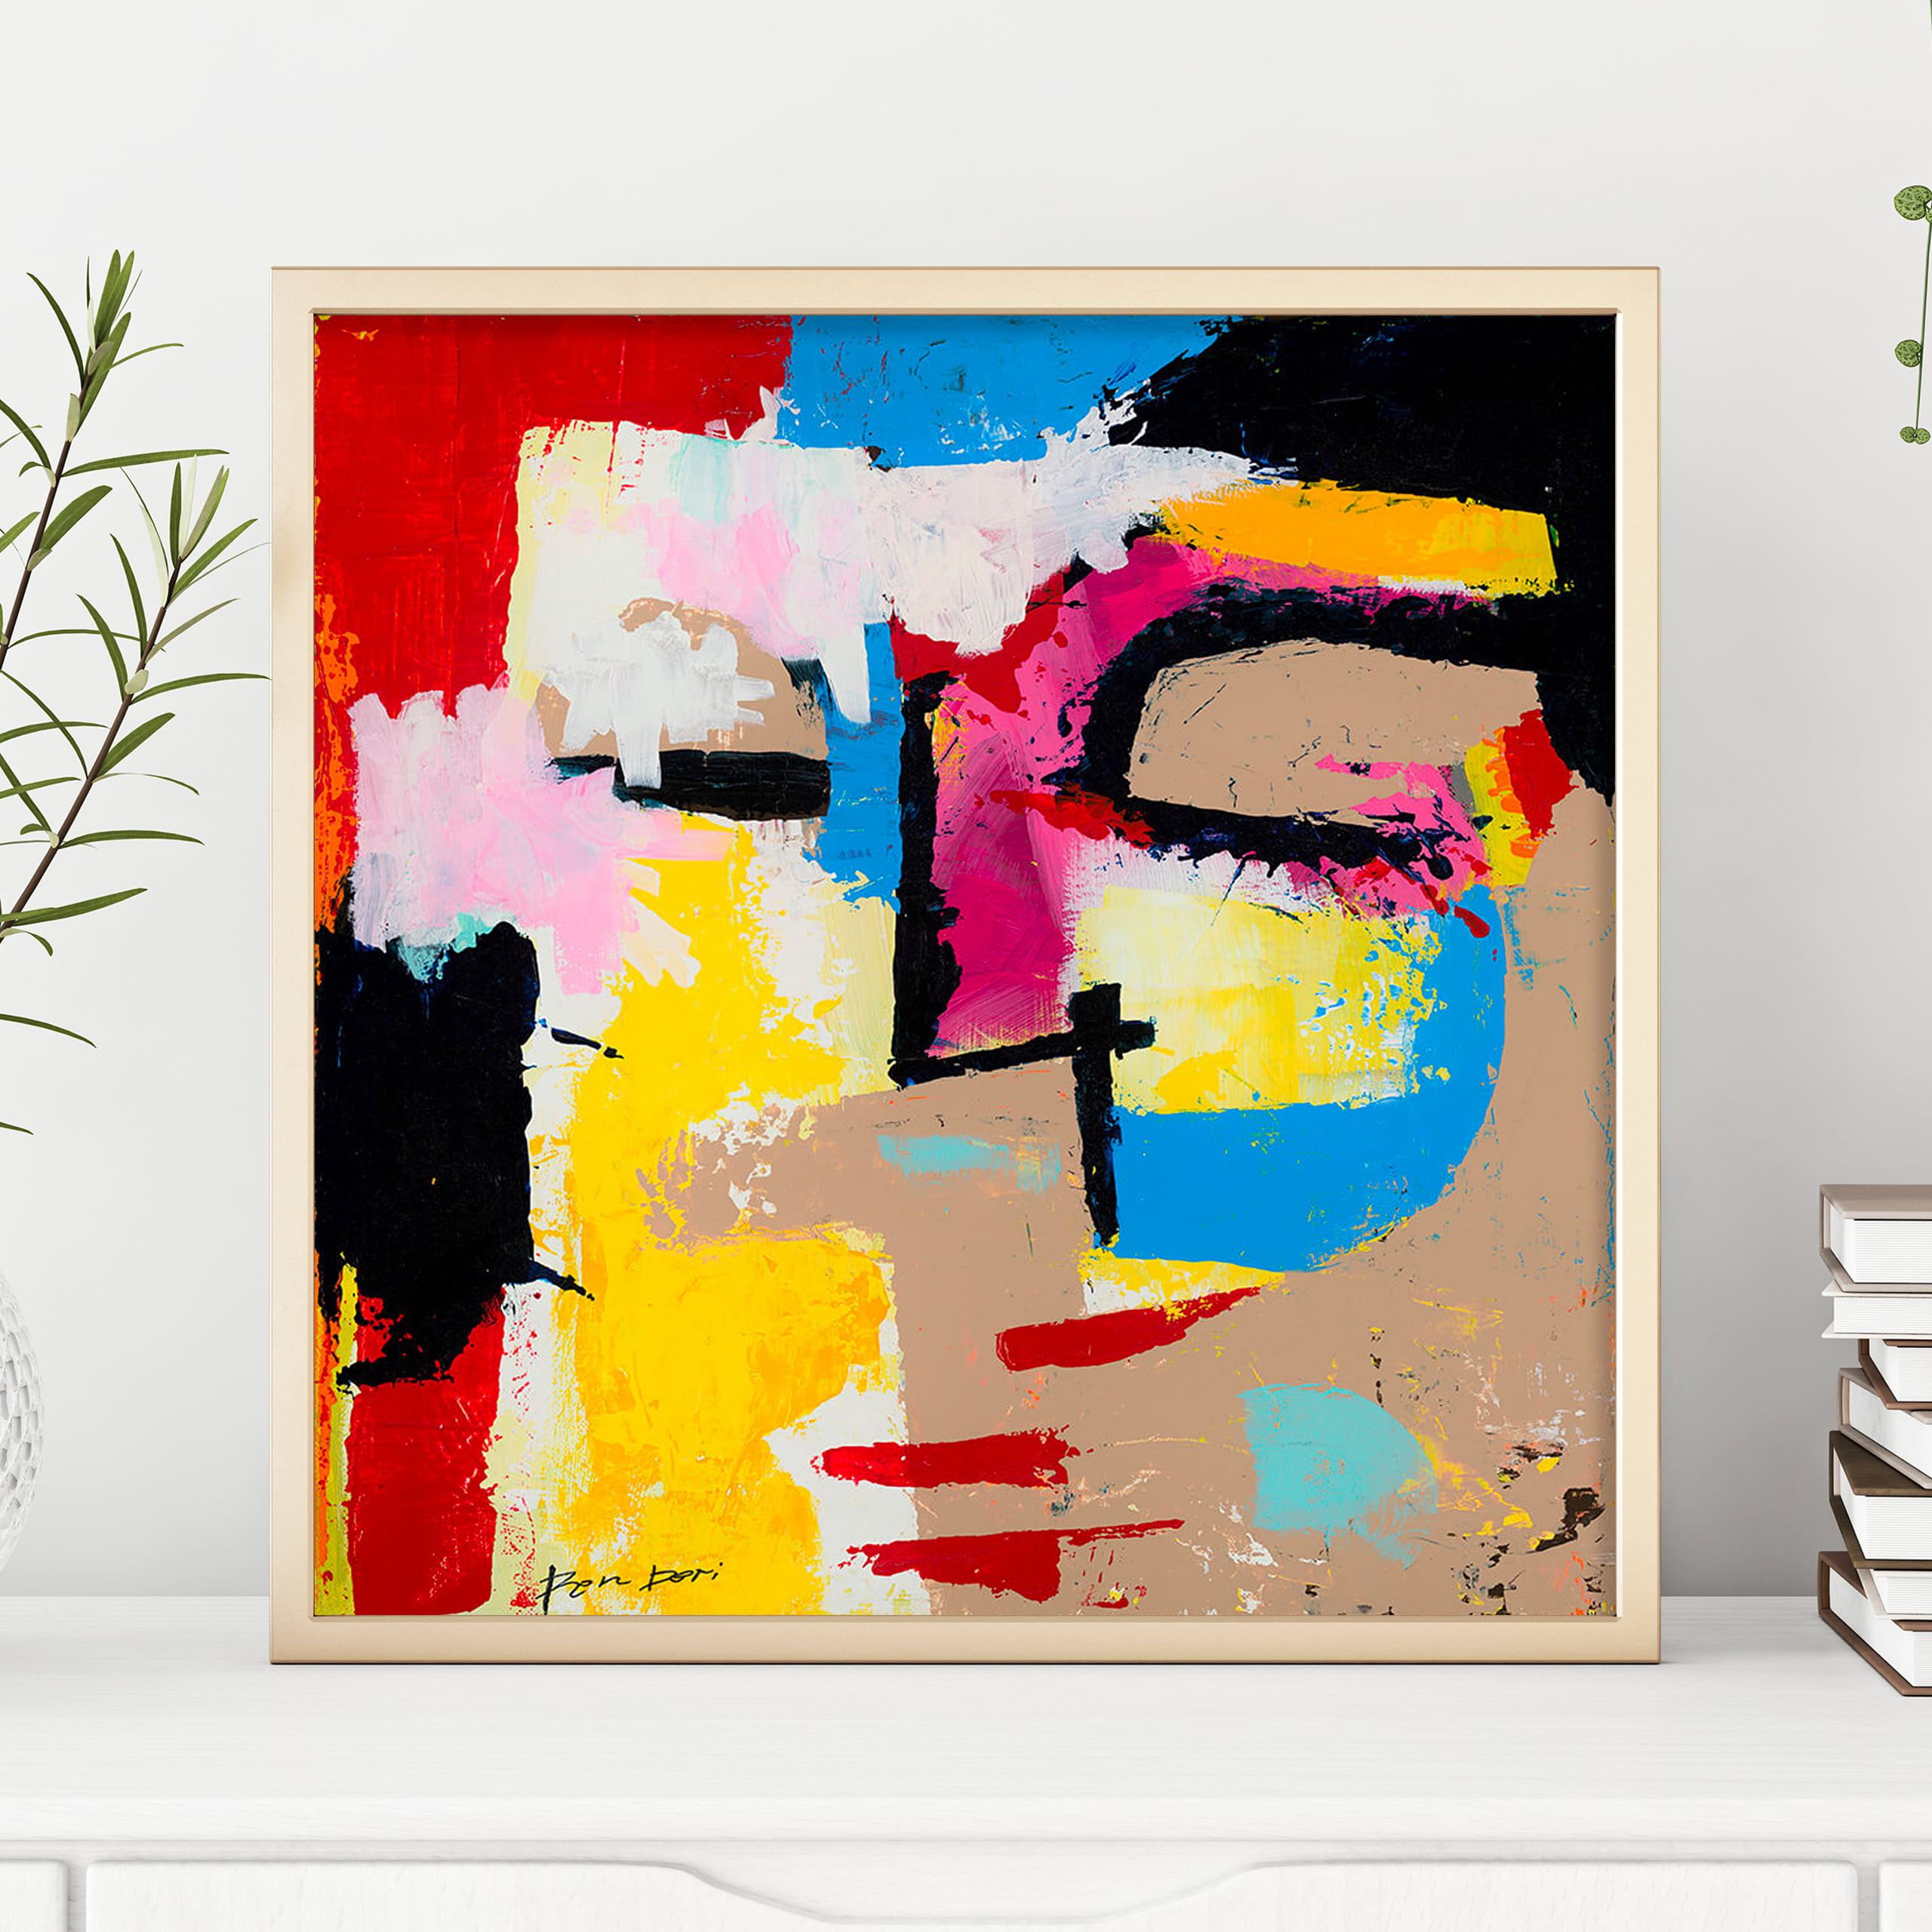 human face abstract art print colorful - disturbia